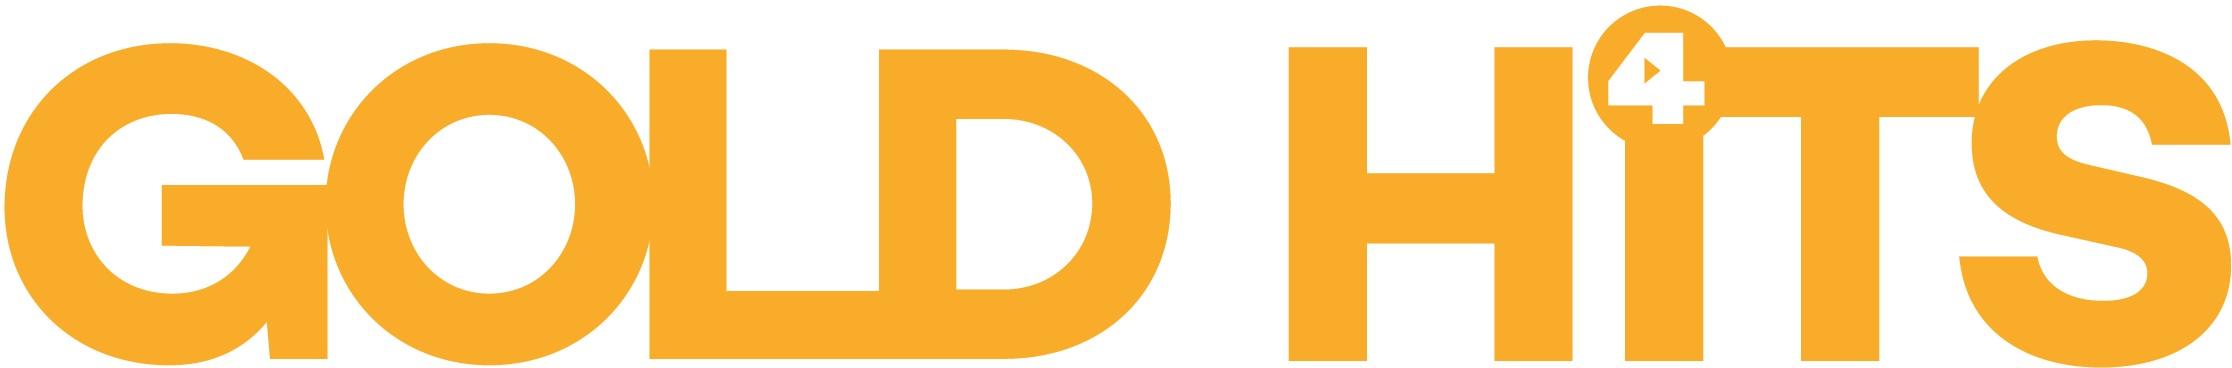 File:4FUN GOLD HITS logo.jpg